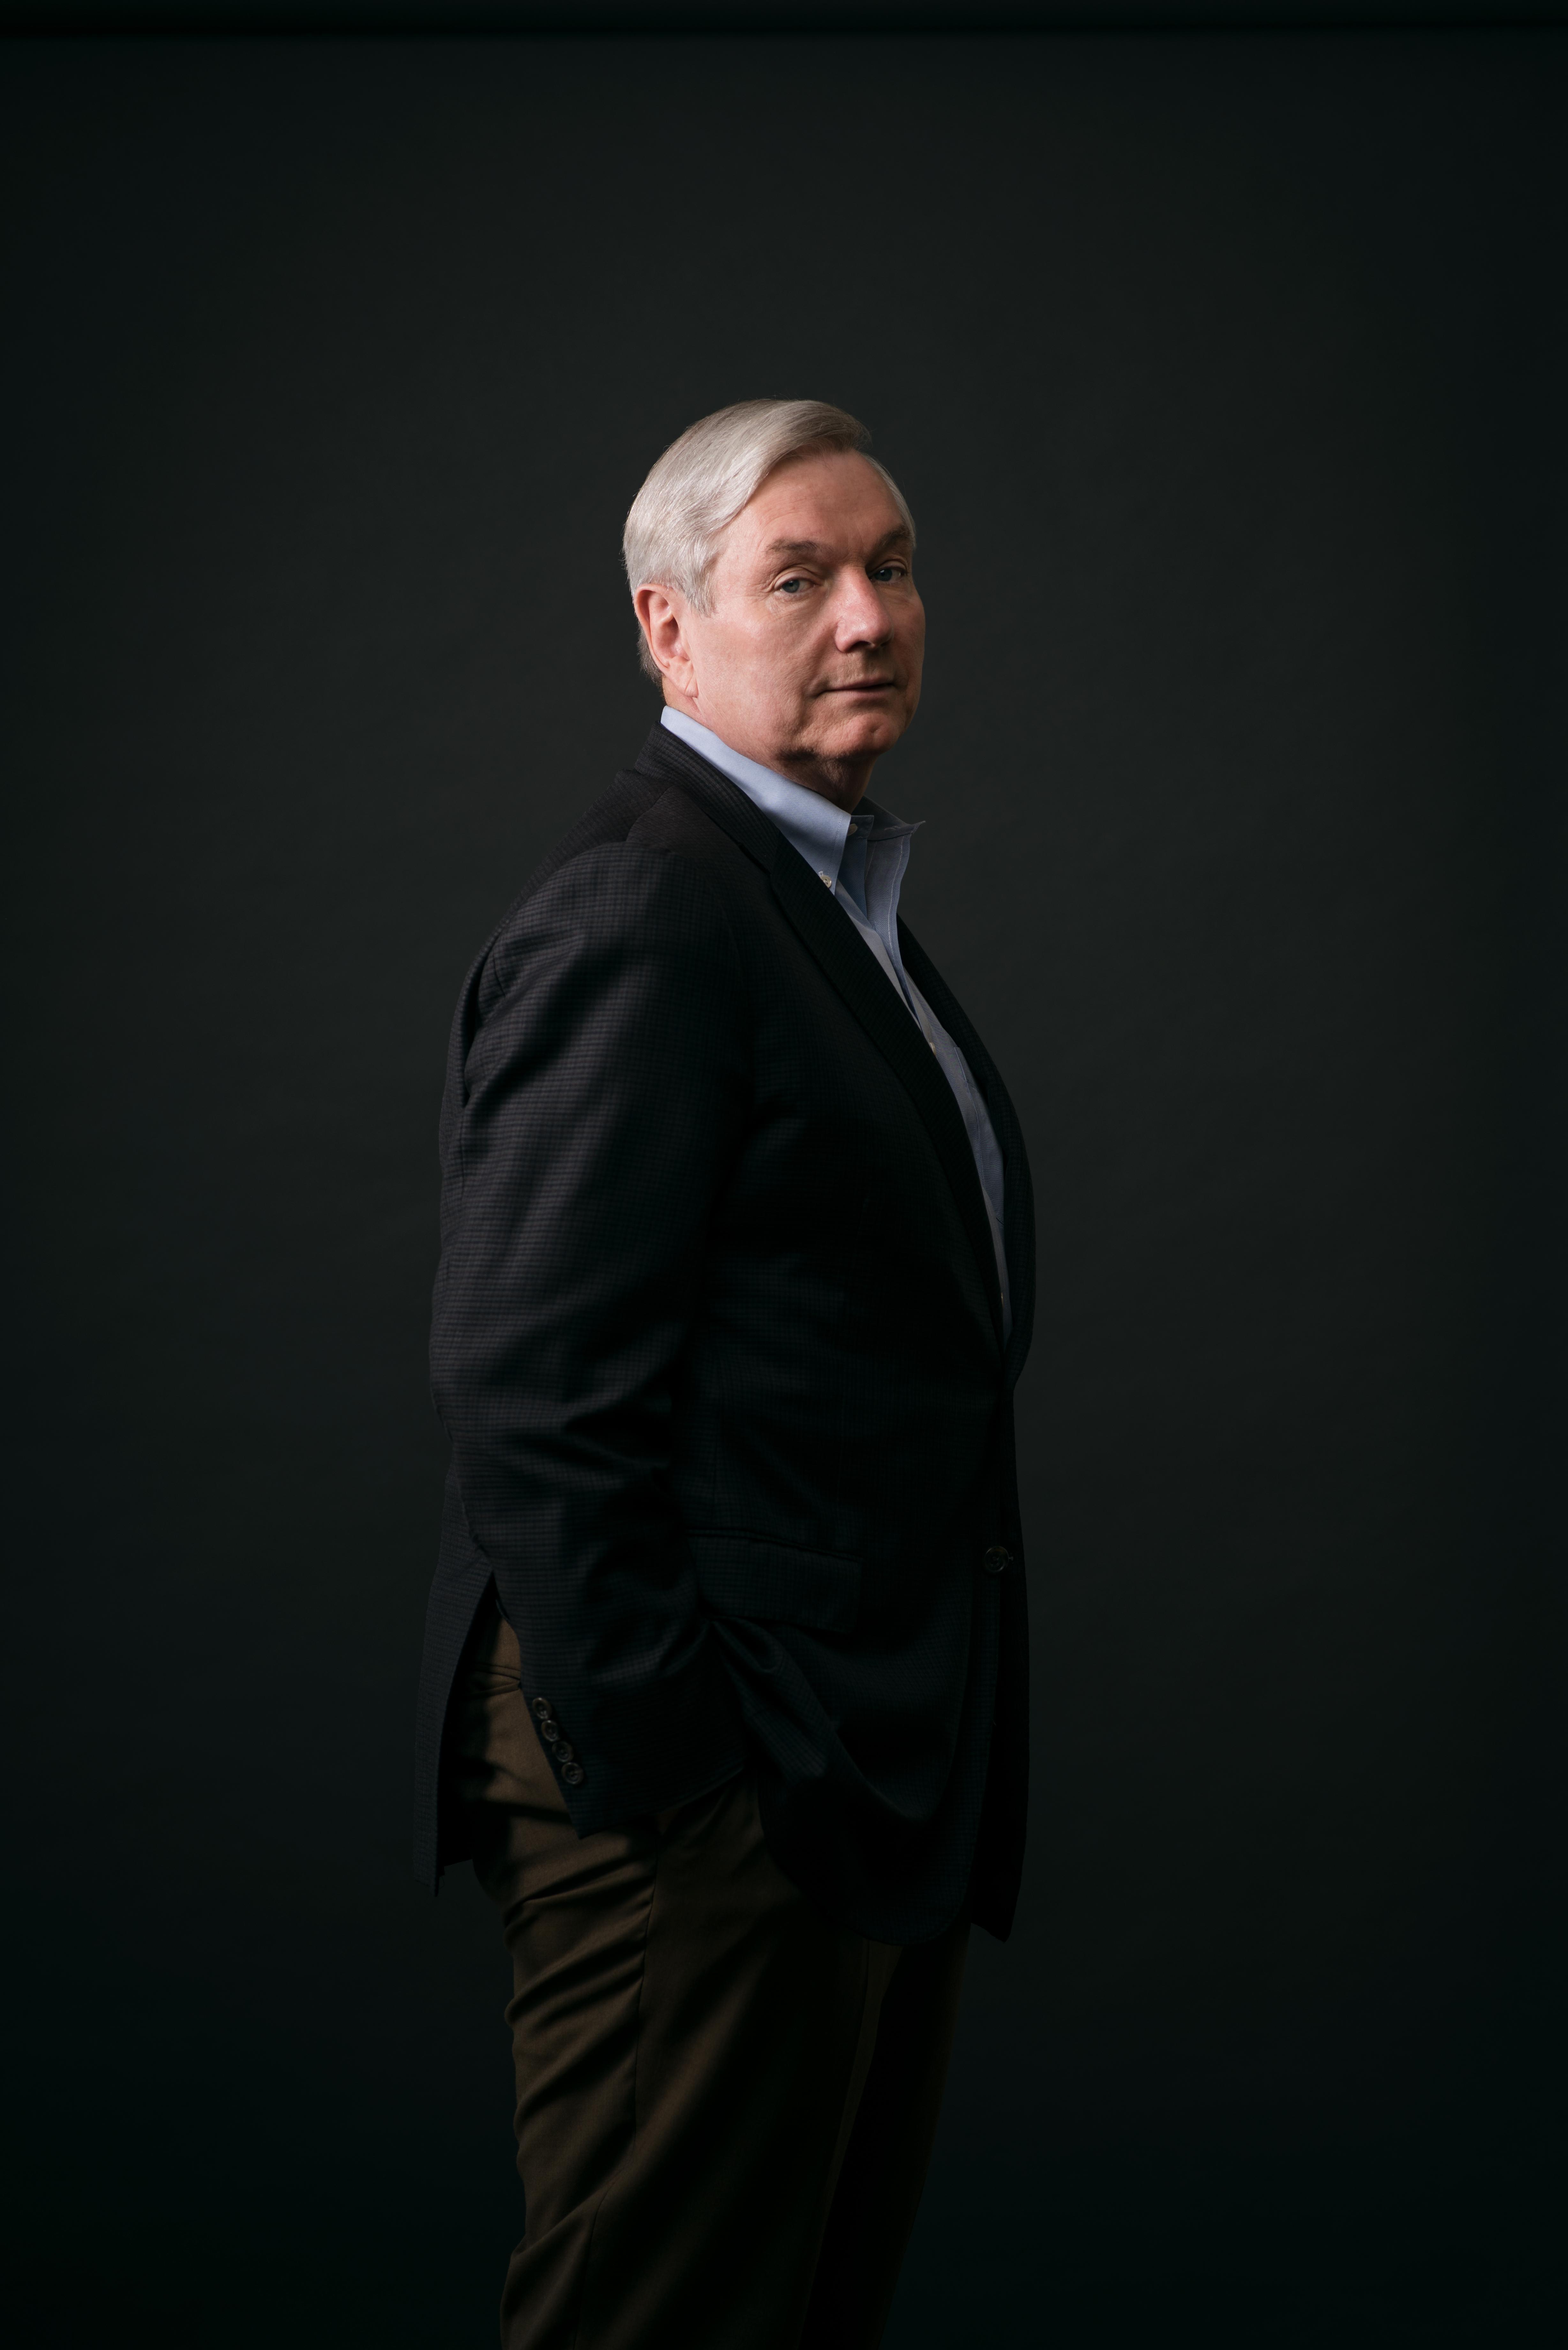 Michael Osterholm